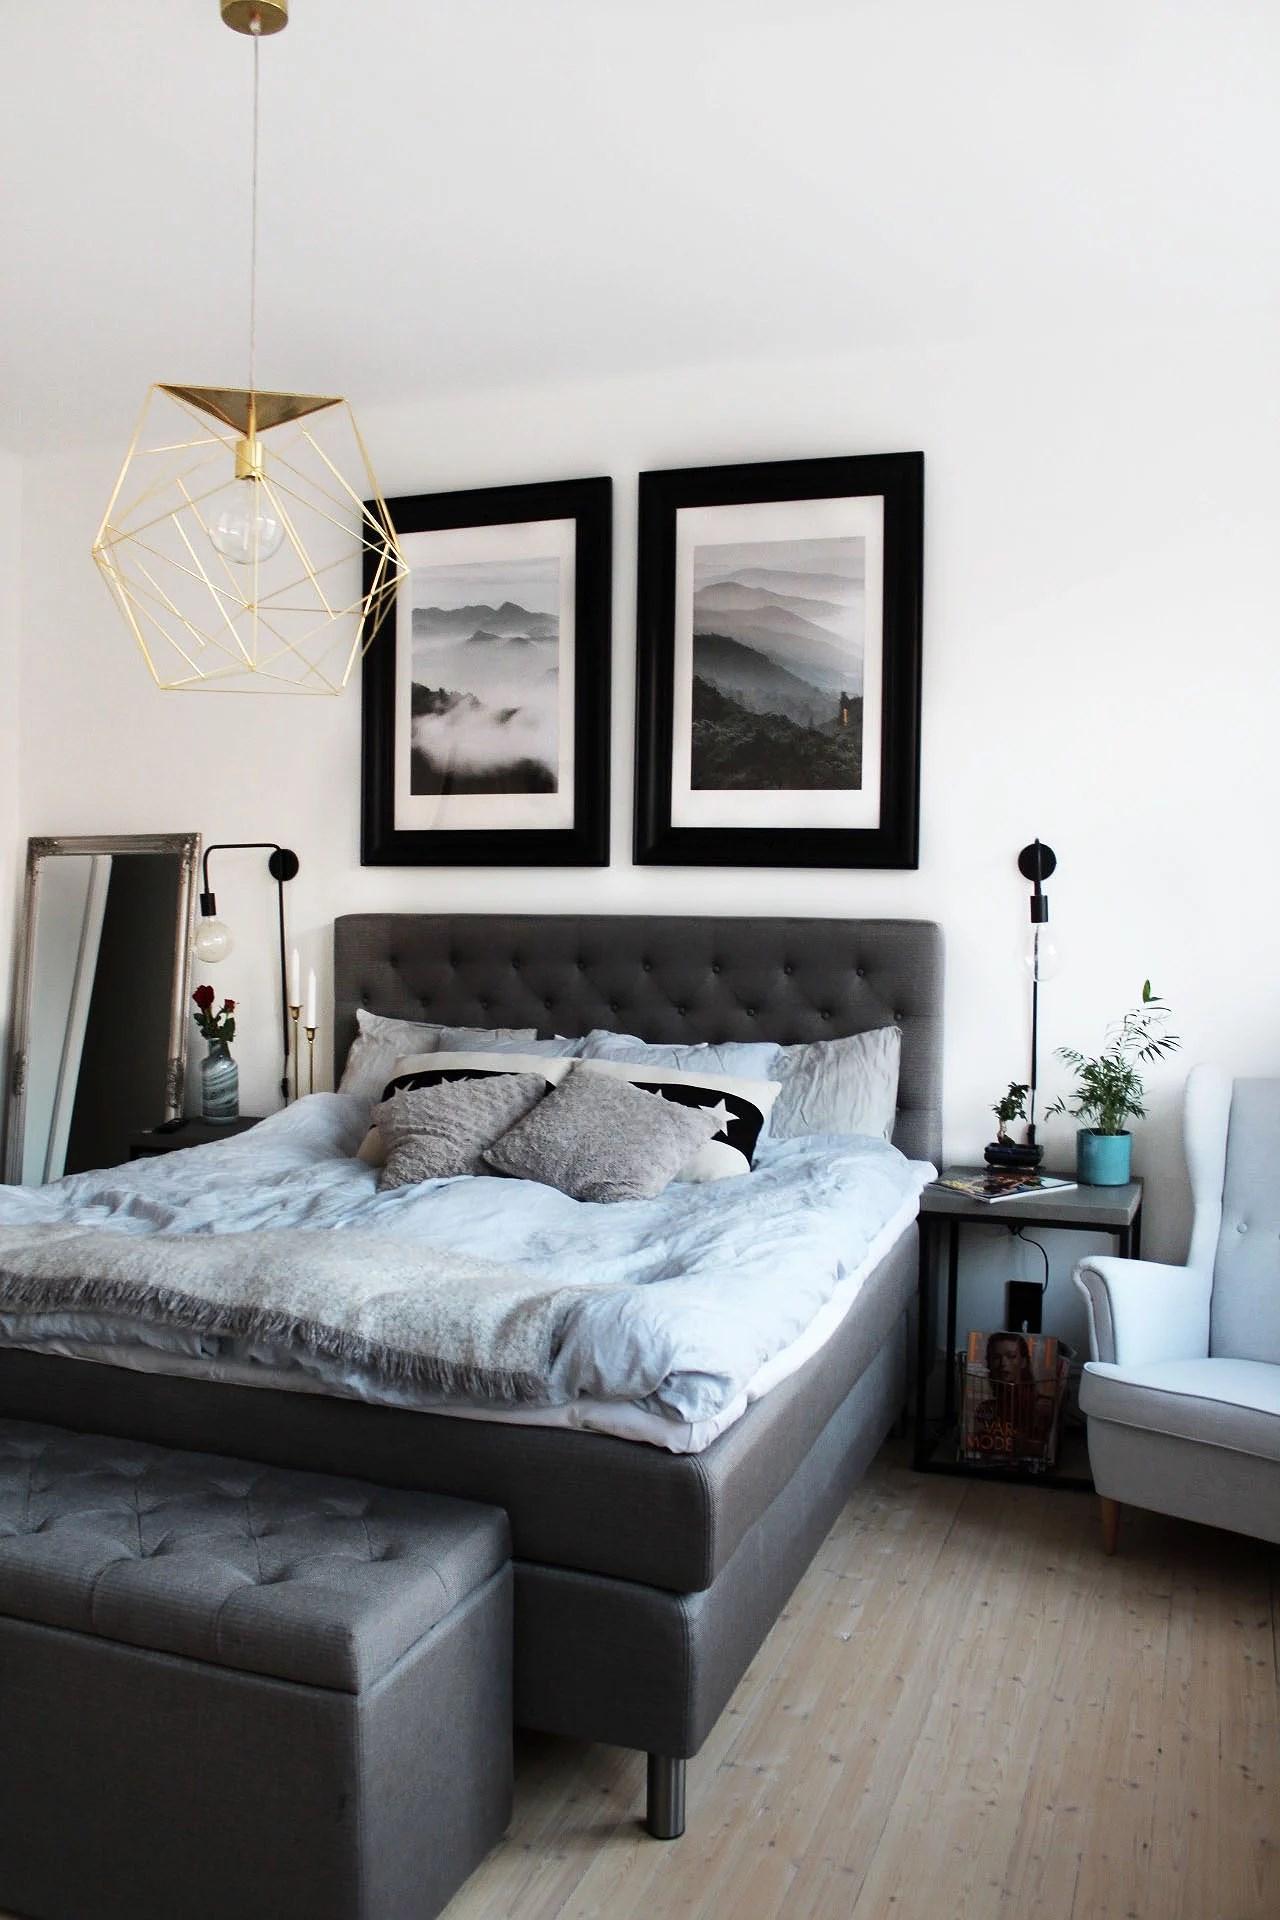 Take a look: bedroom